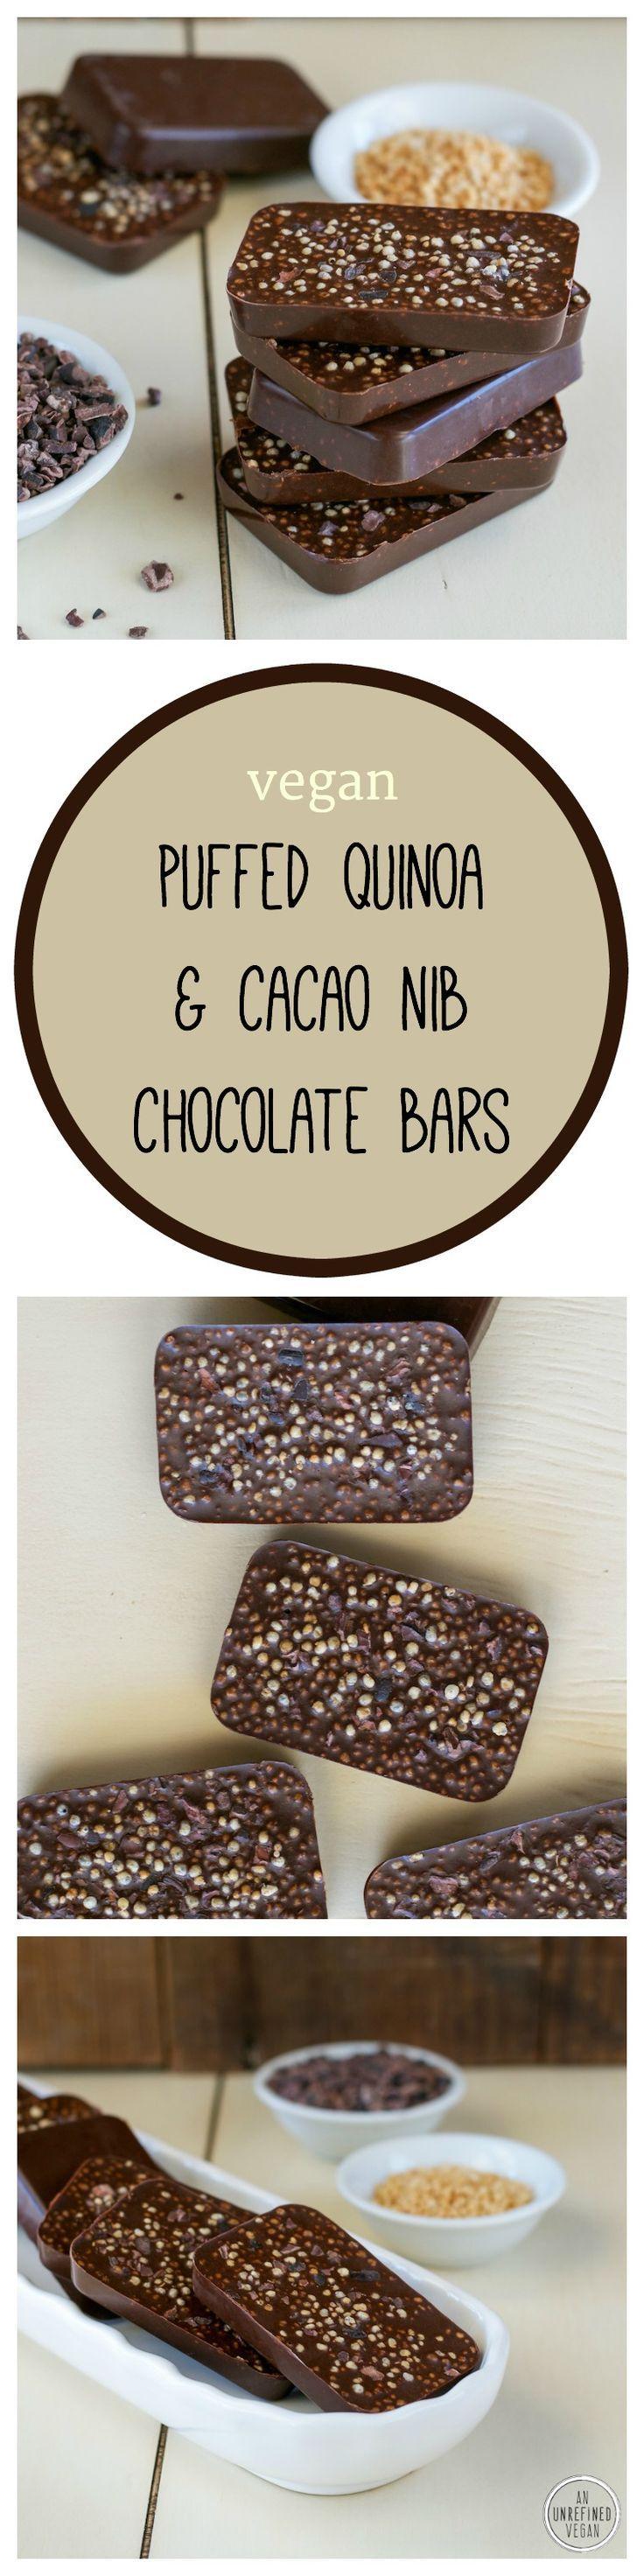 Vegan, gluten-free Puffed Quinoa & Cacao Nib Chocolate Bars by An Unrefined Vegan.